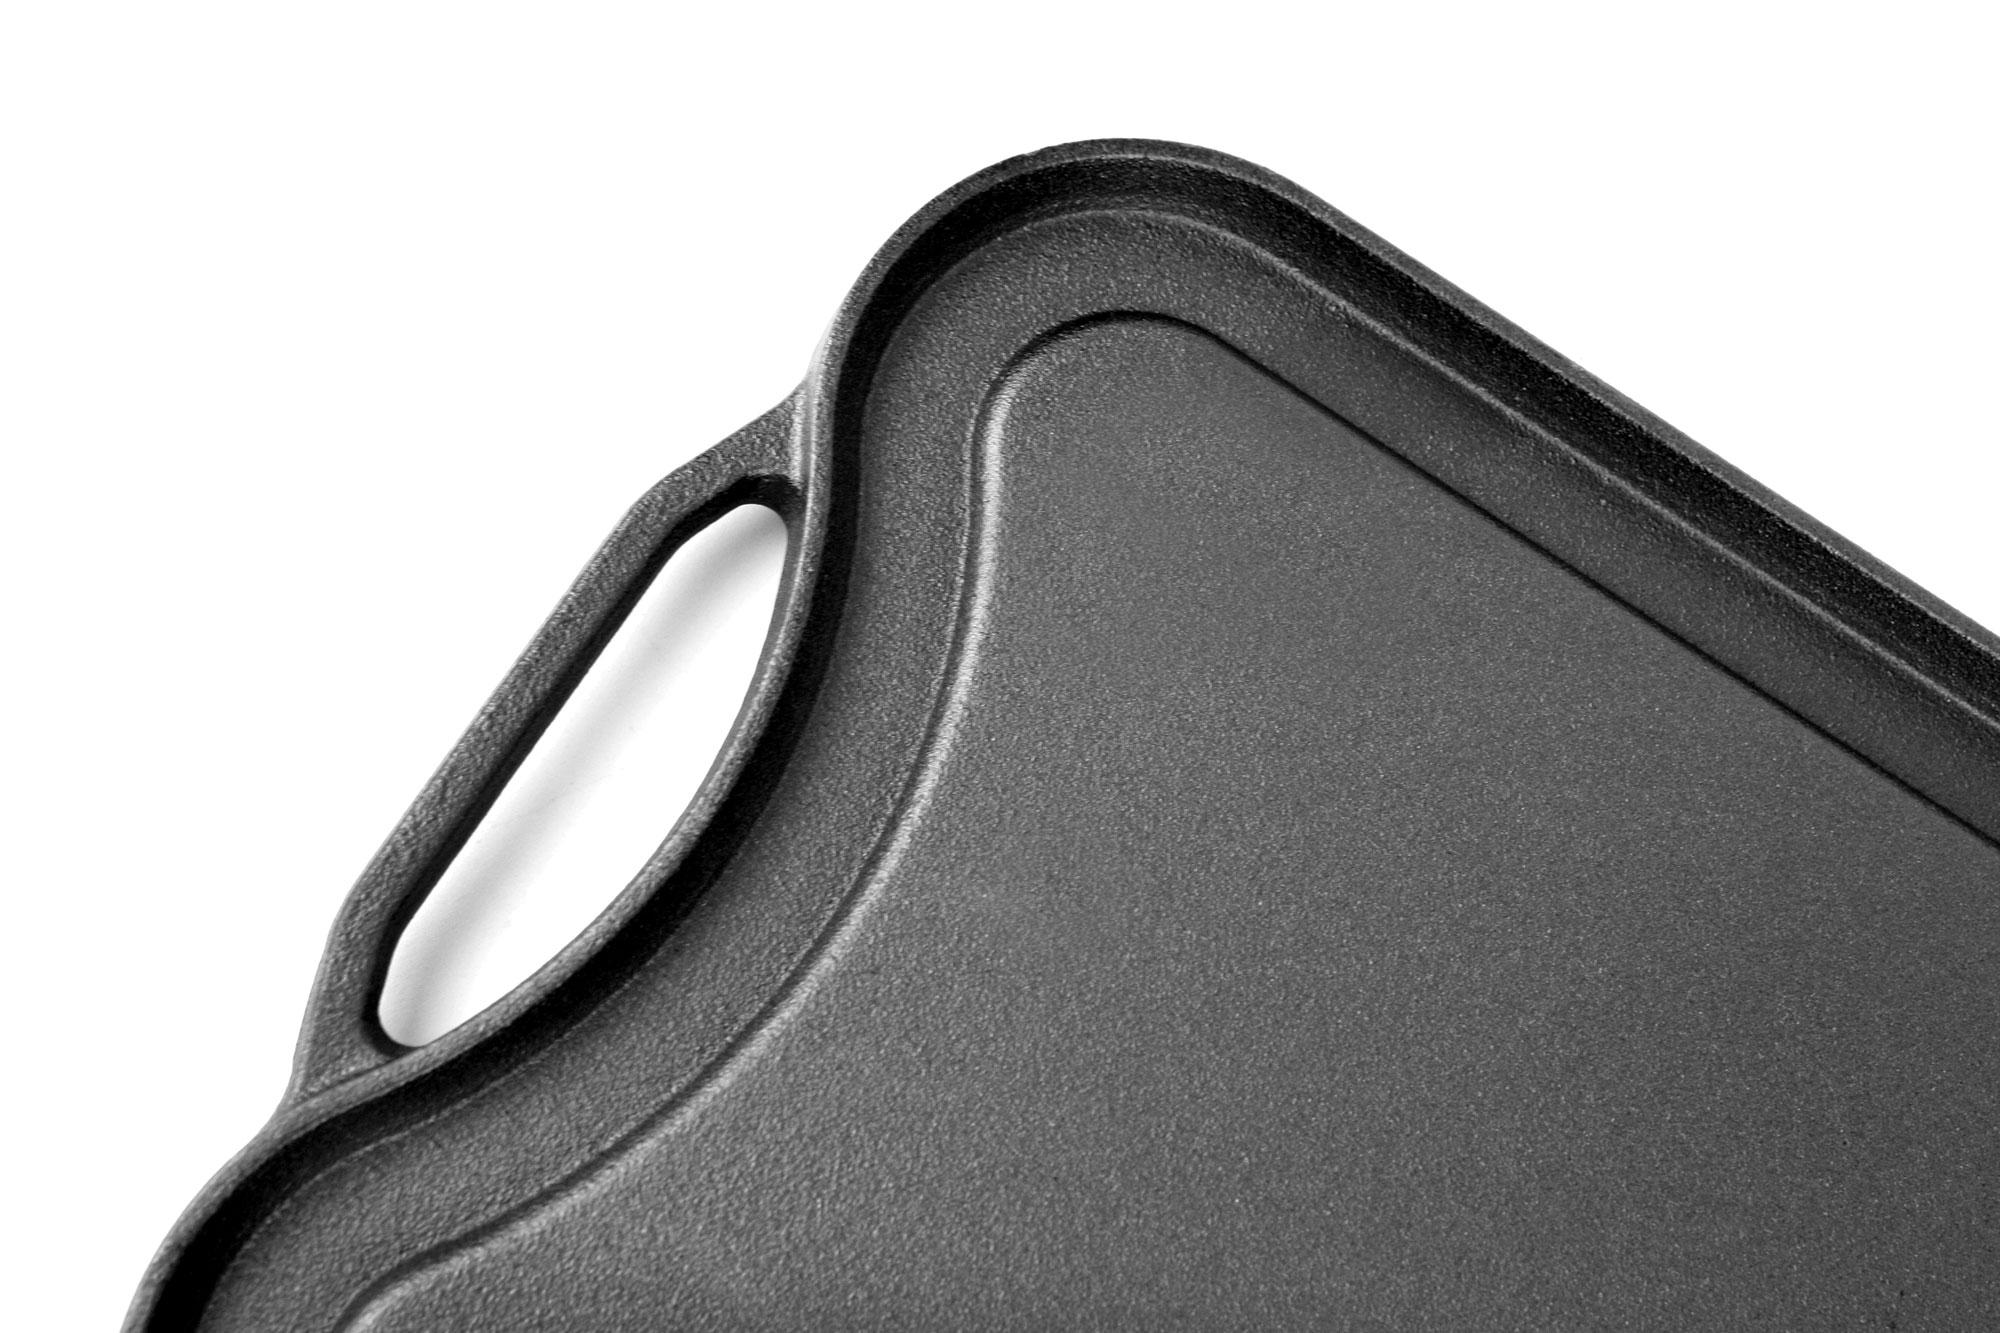 viking cast iron reversible griddle grill pan 20 inch. Black Bedroom Furniture Sets. Home Design Ideas